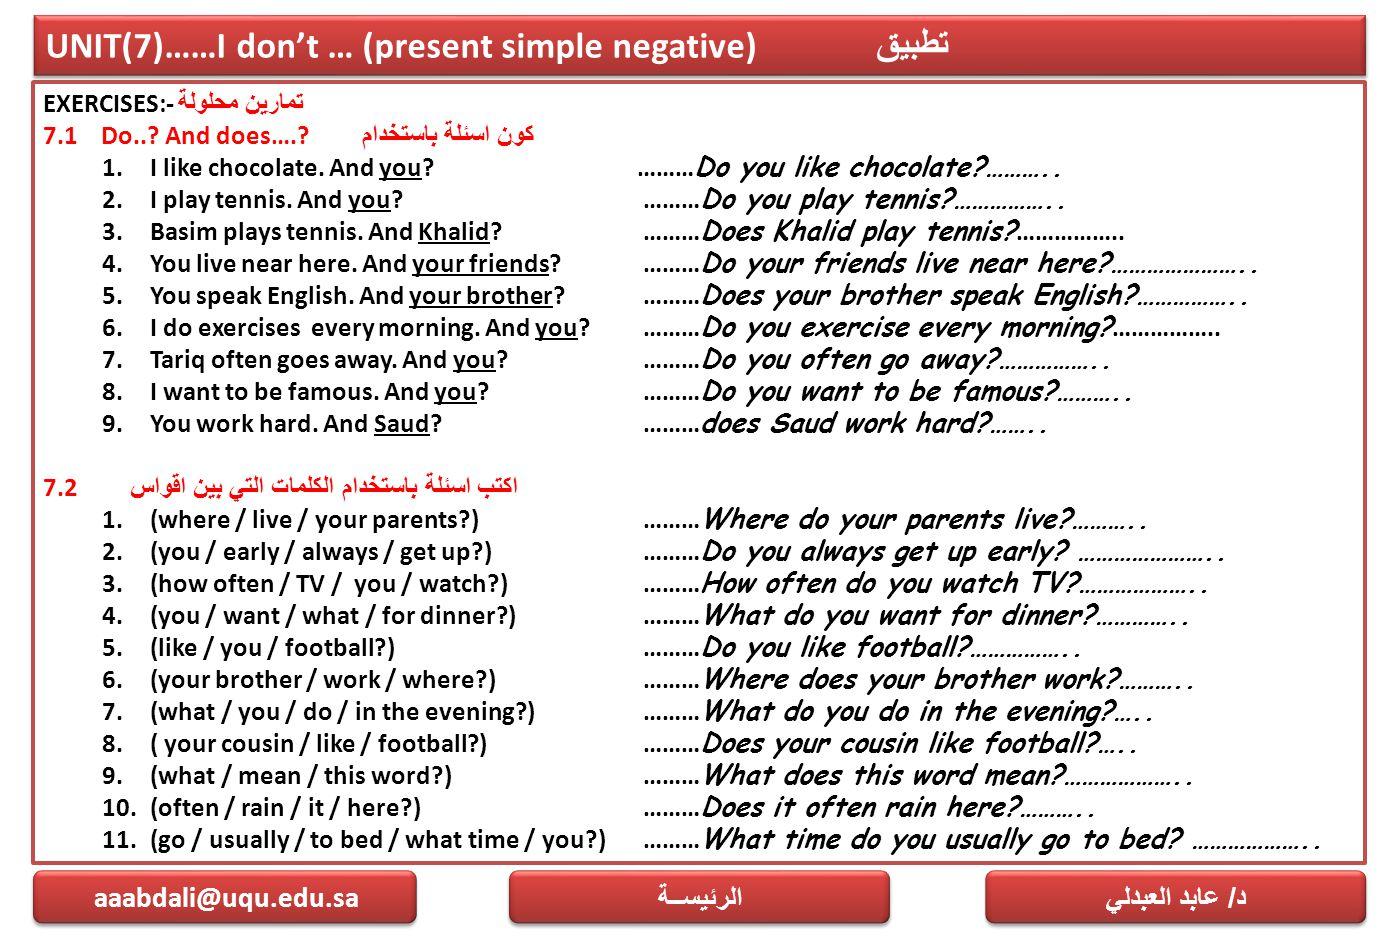 UNIT(7)……I don't … (present simple negative) تطبيق